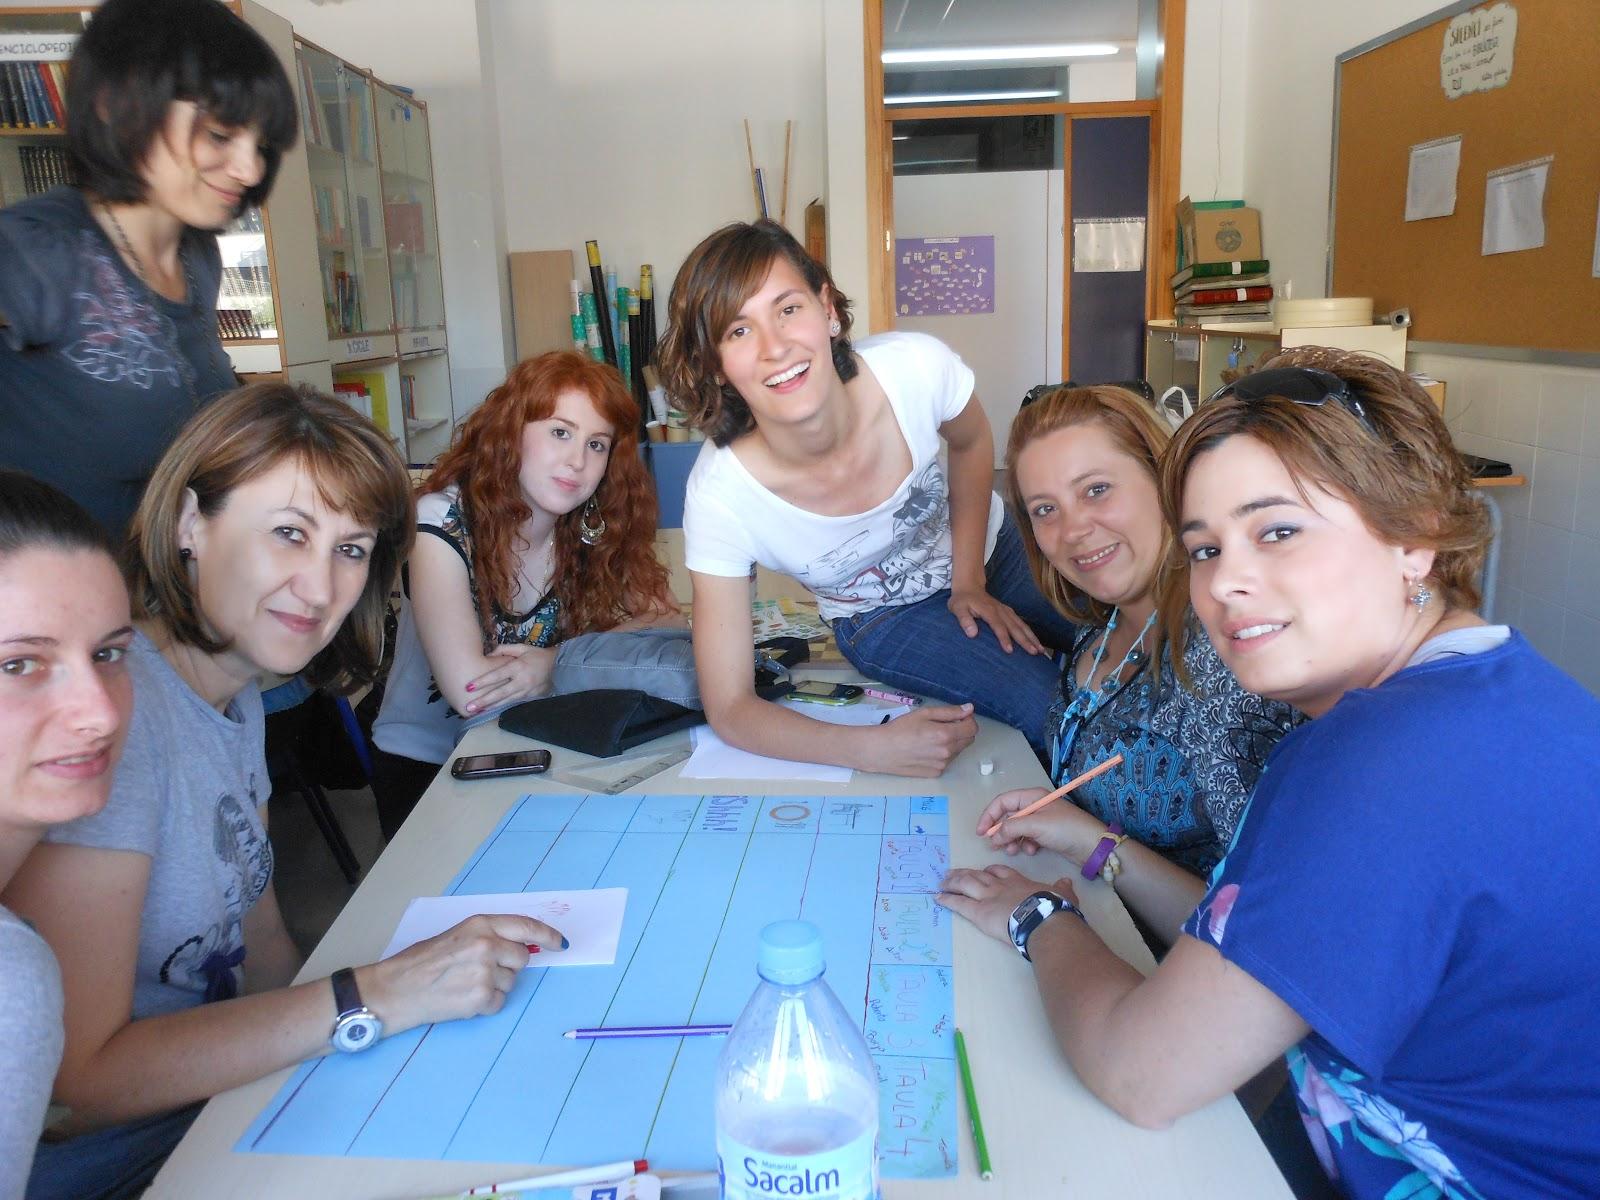 Florencia Moragas : Comedores escolares. Curso de monitor de comedor ...